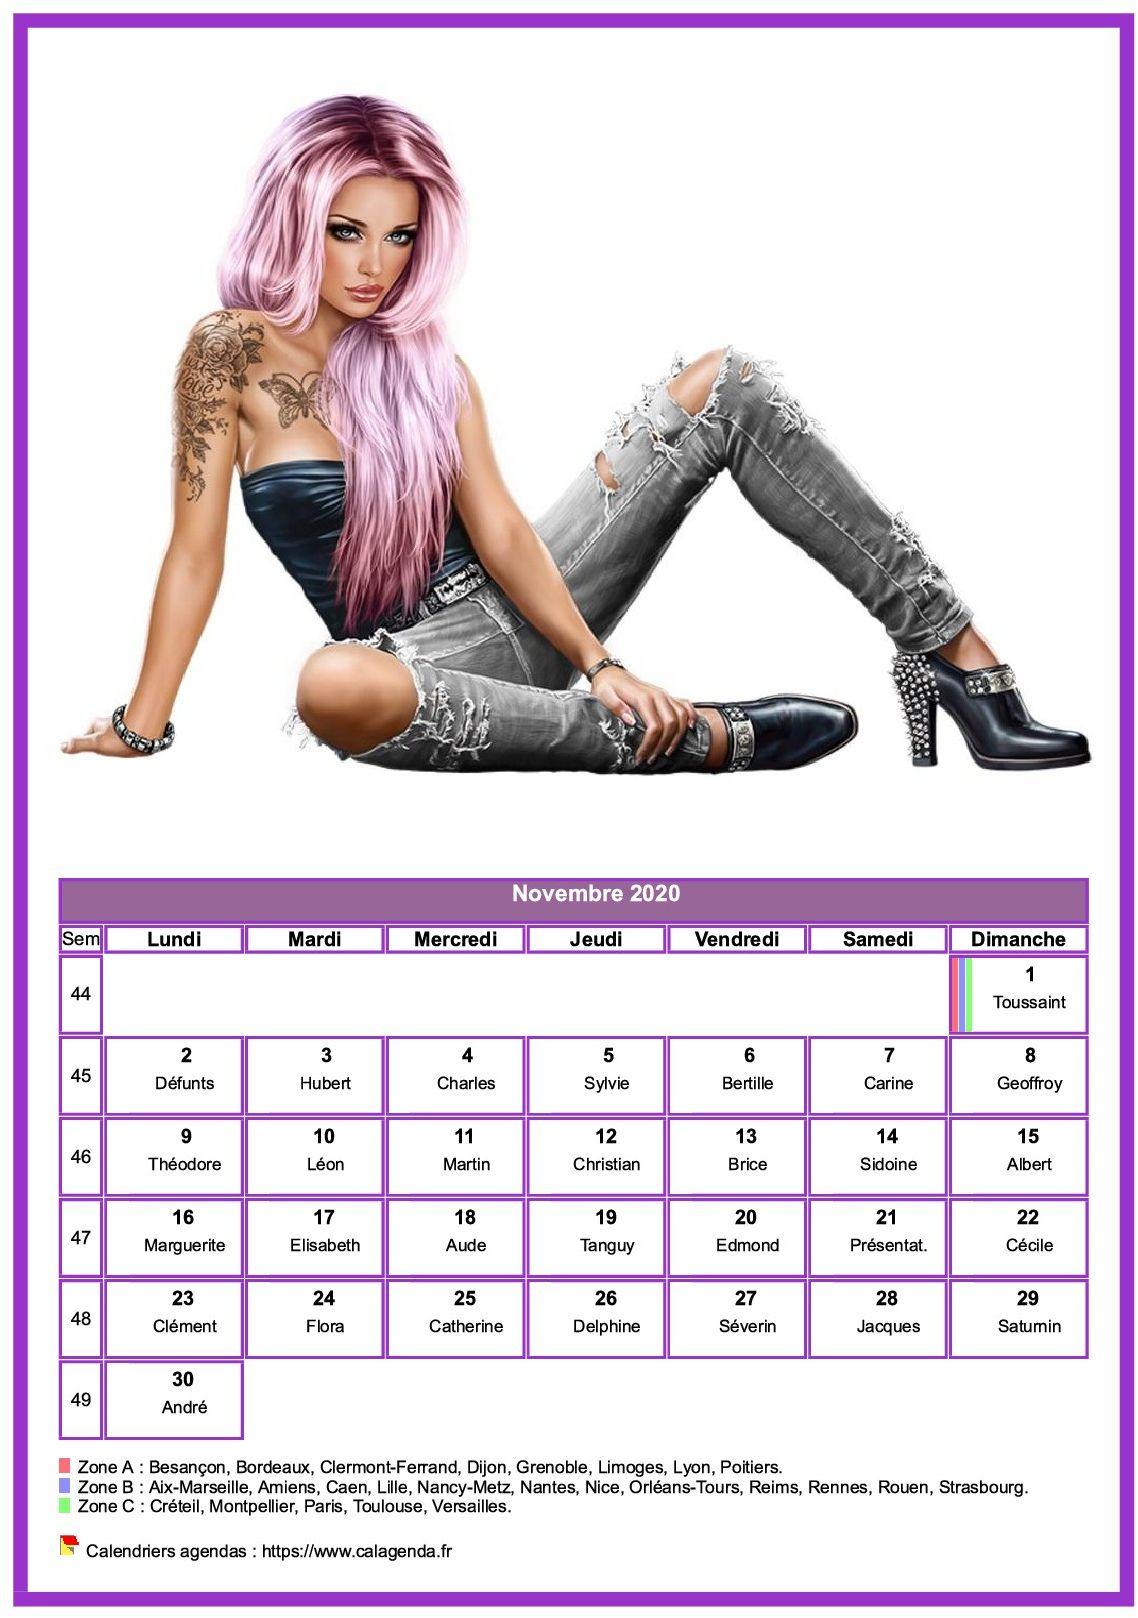 Calendrier Novembre 2020.Calendrier Novembre 2020 Femmes